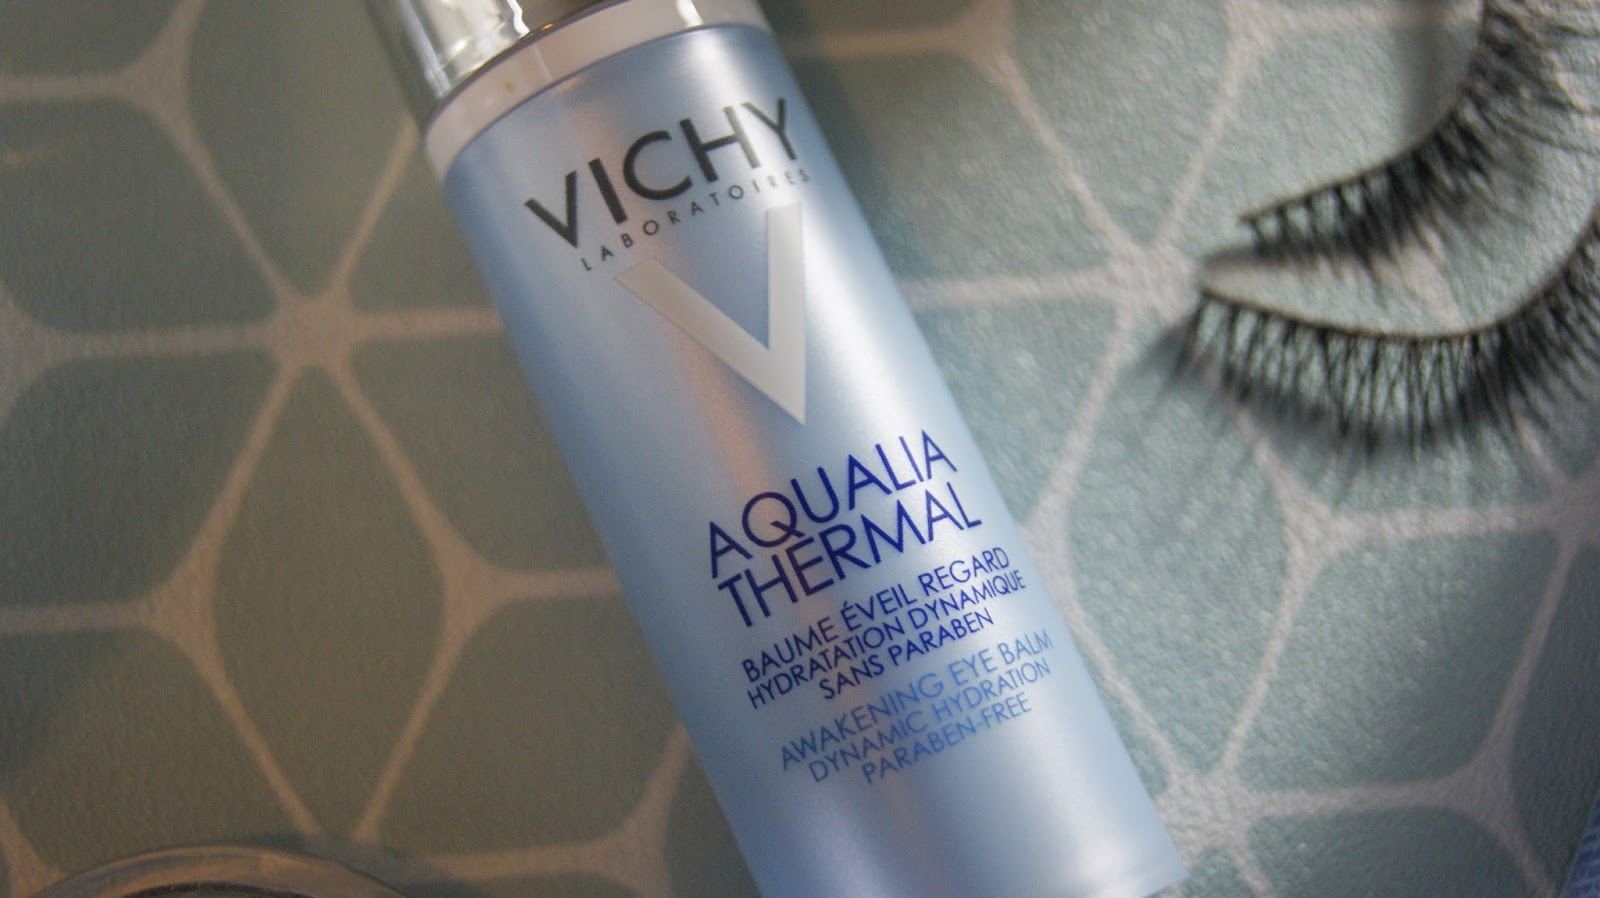 Vichy Aqualia Thermal Awakening Eye Balm A Life With Frills